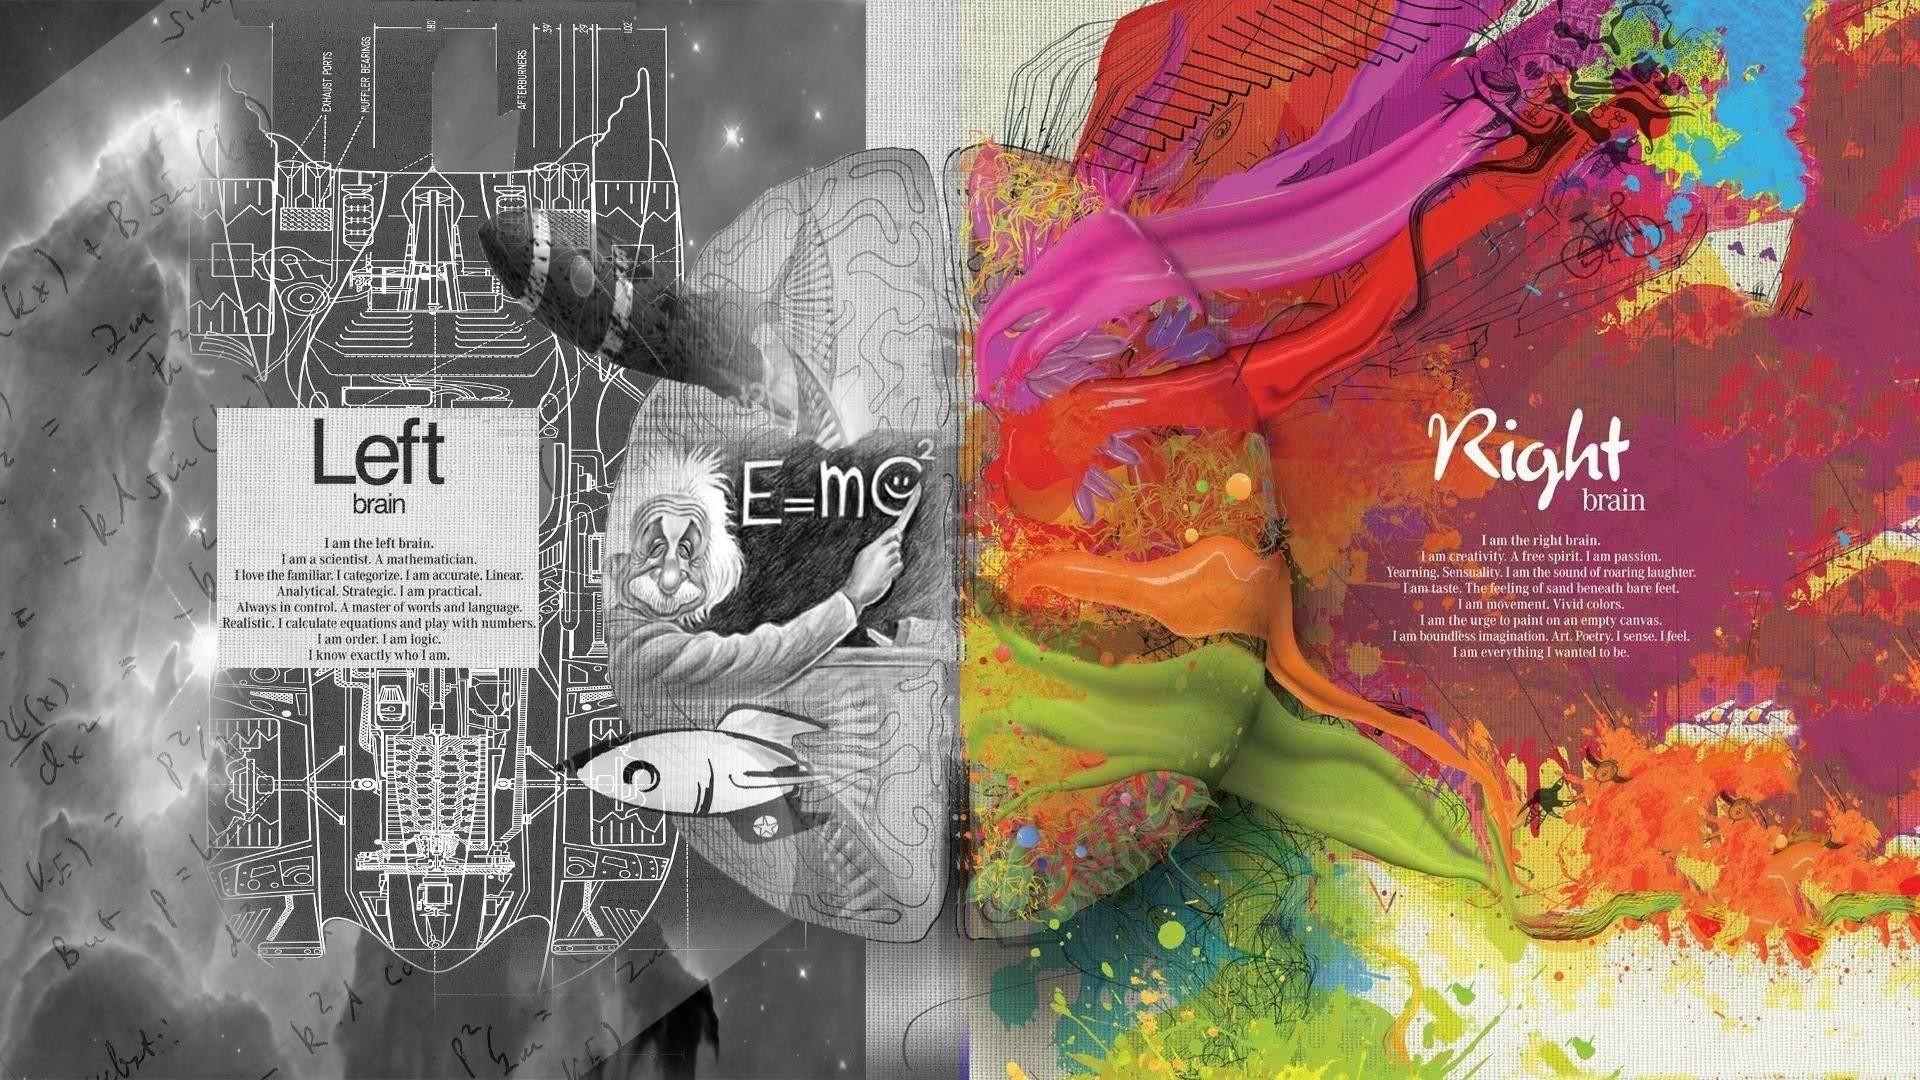 Science-artistic-artwork-paint-brain-splatter-hd-wallpaper .